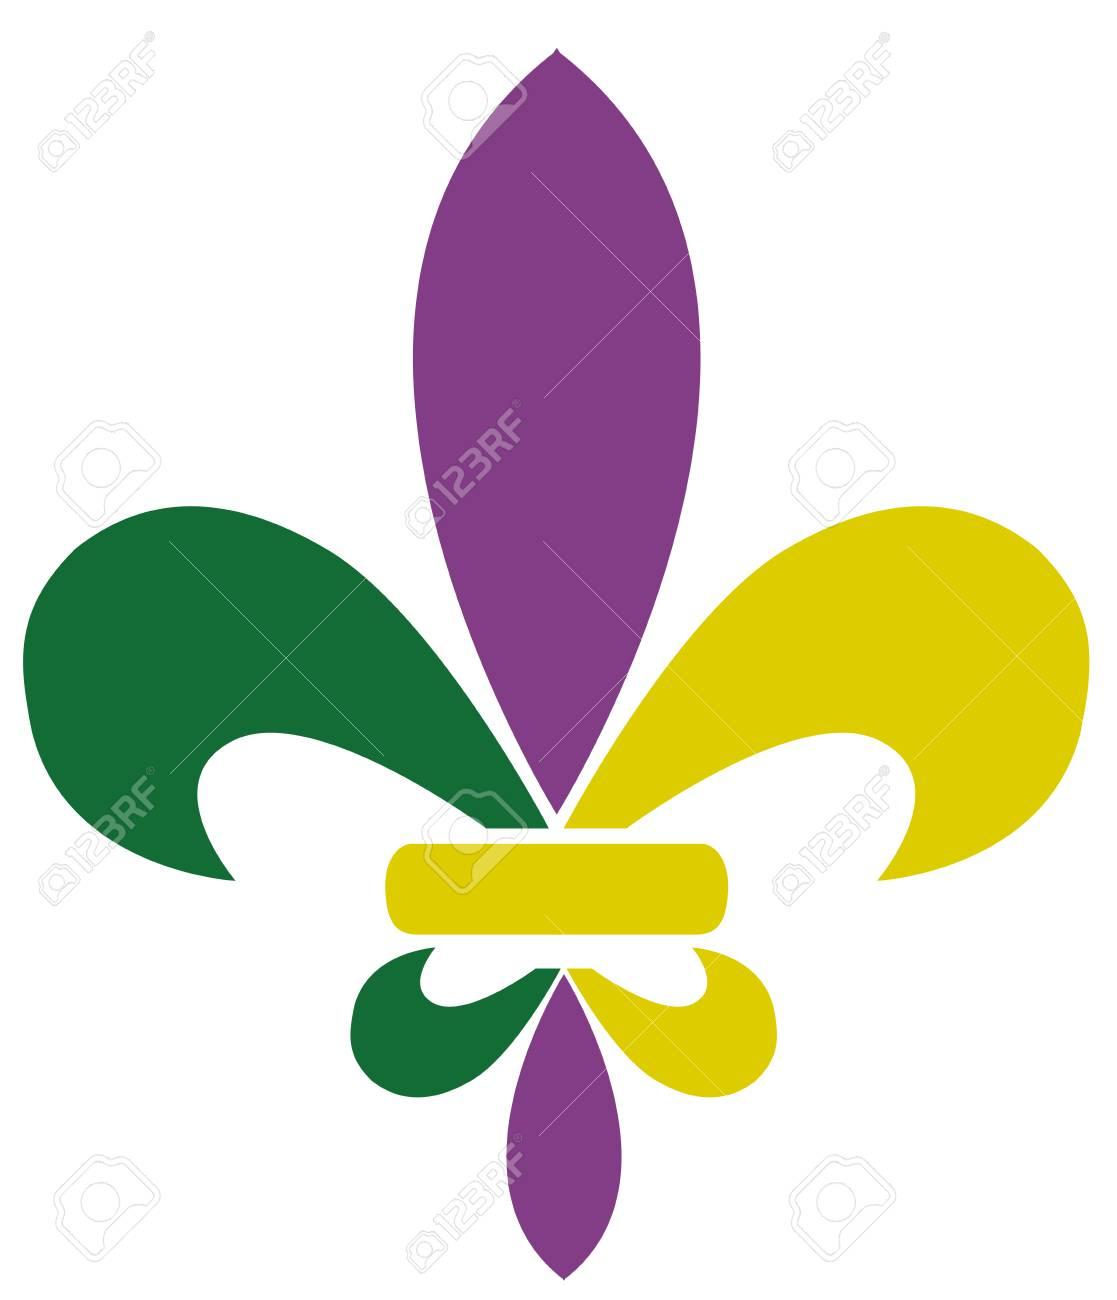 Vector illustration of mardi gras fleur de lis.